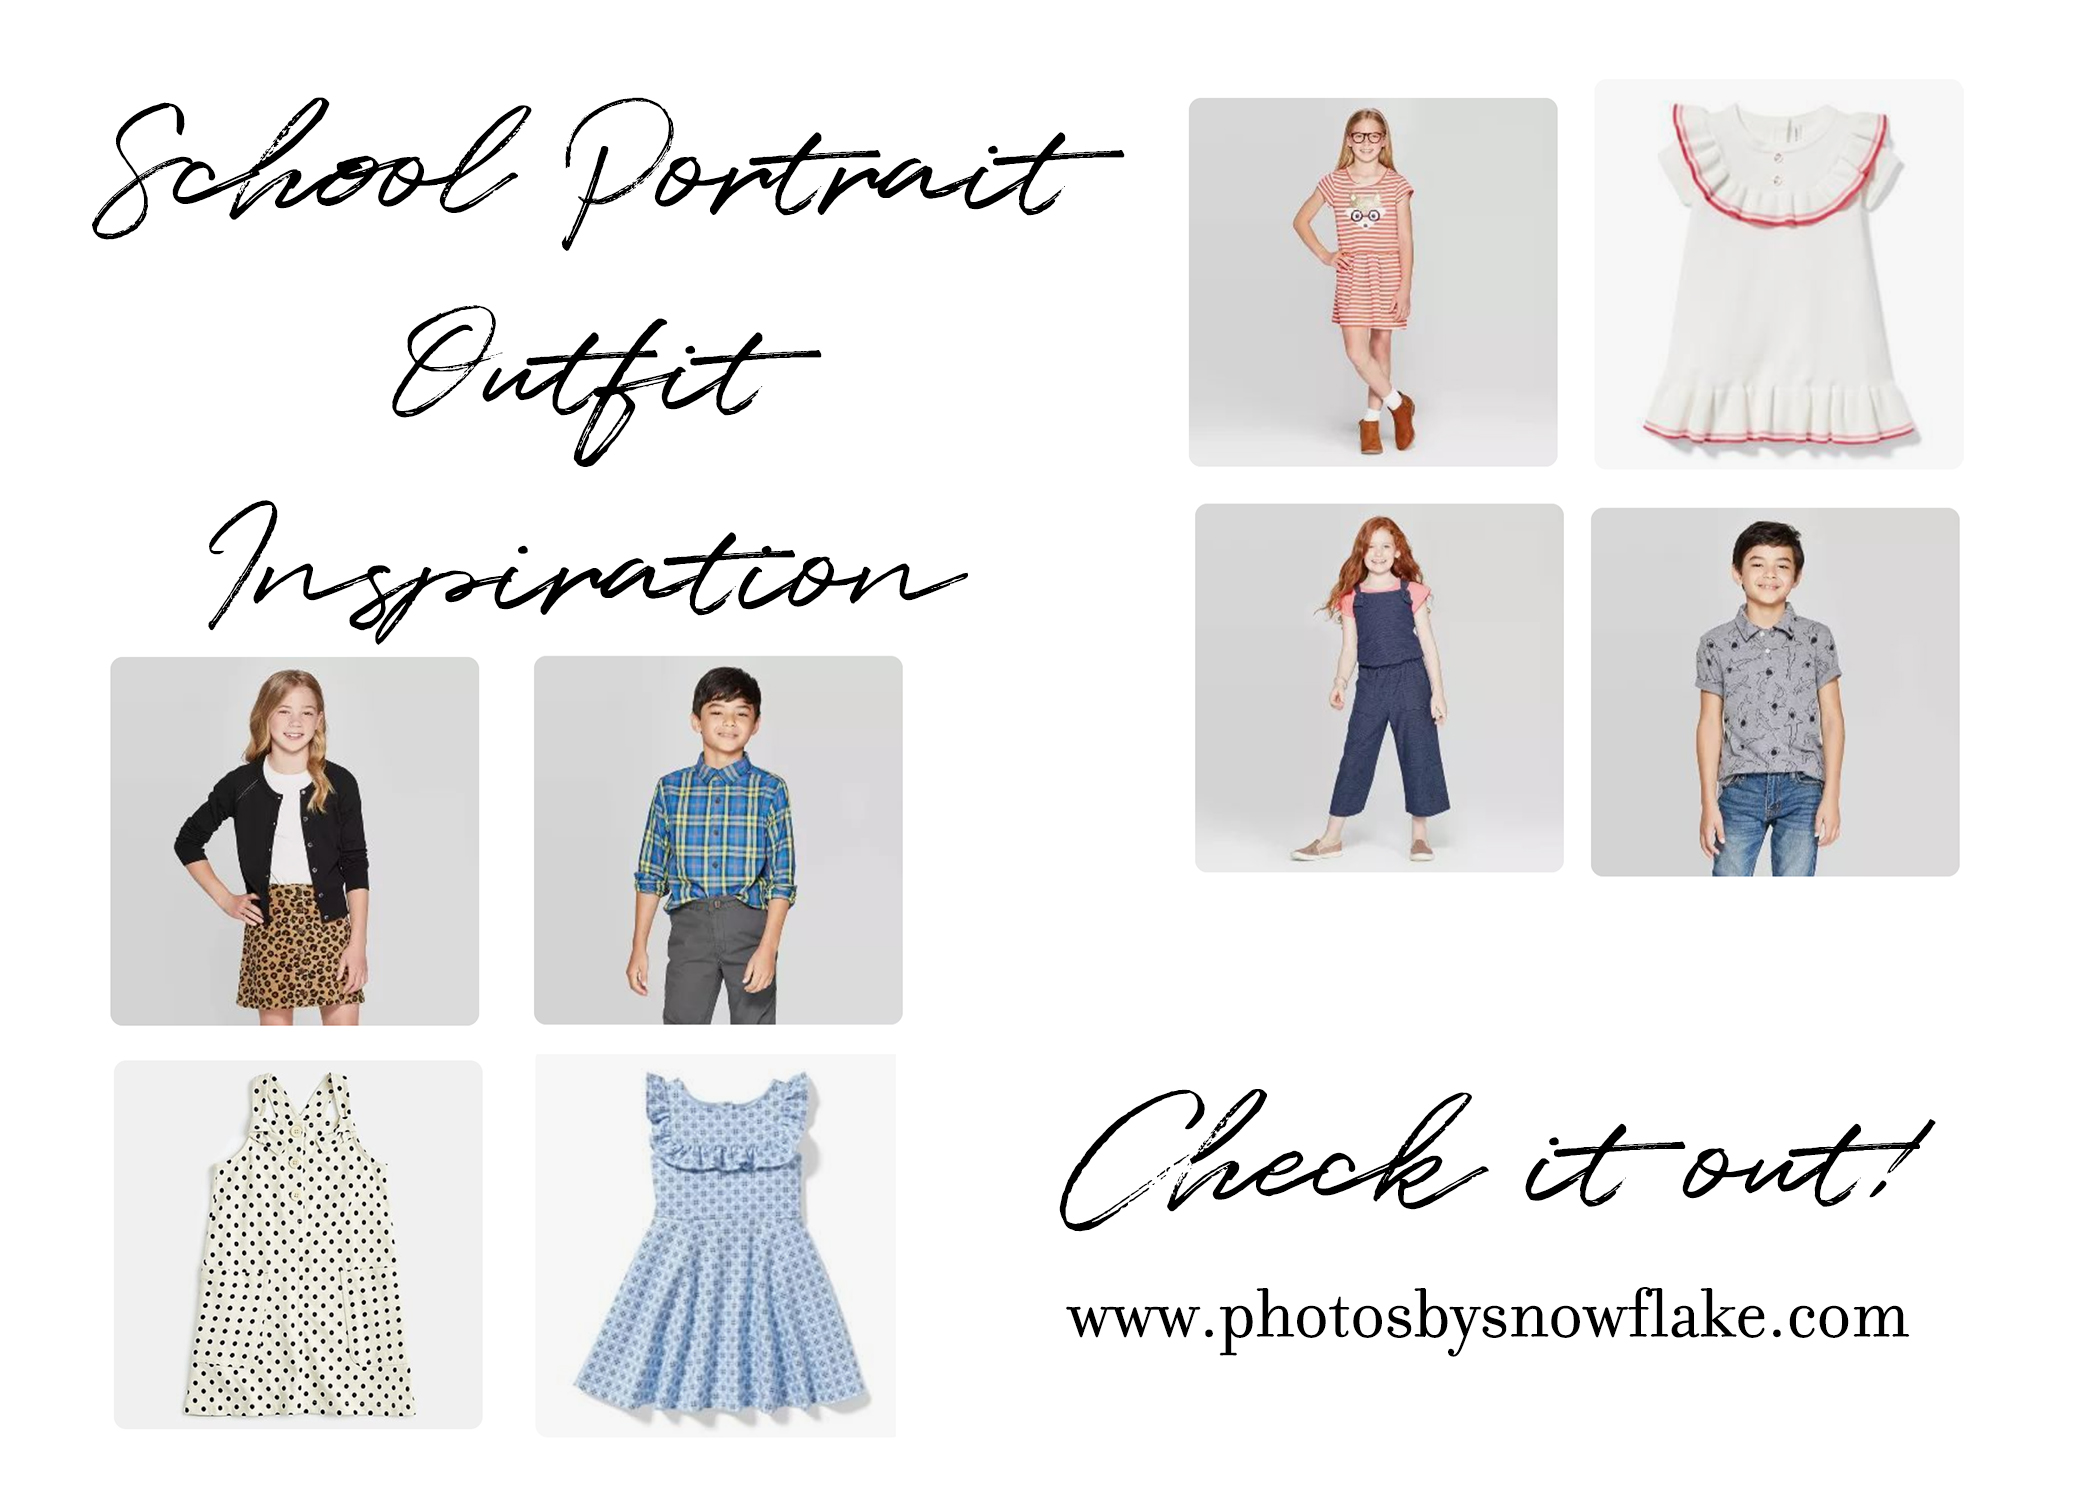 school_portrati_outfit_ideas.jpg